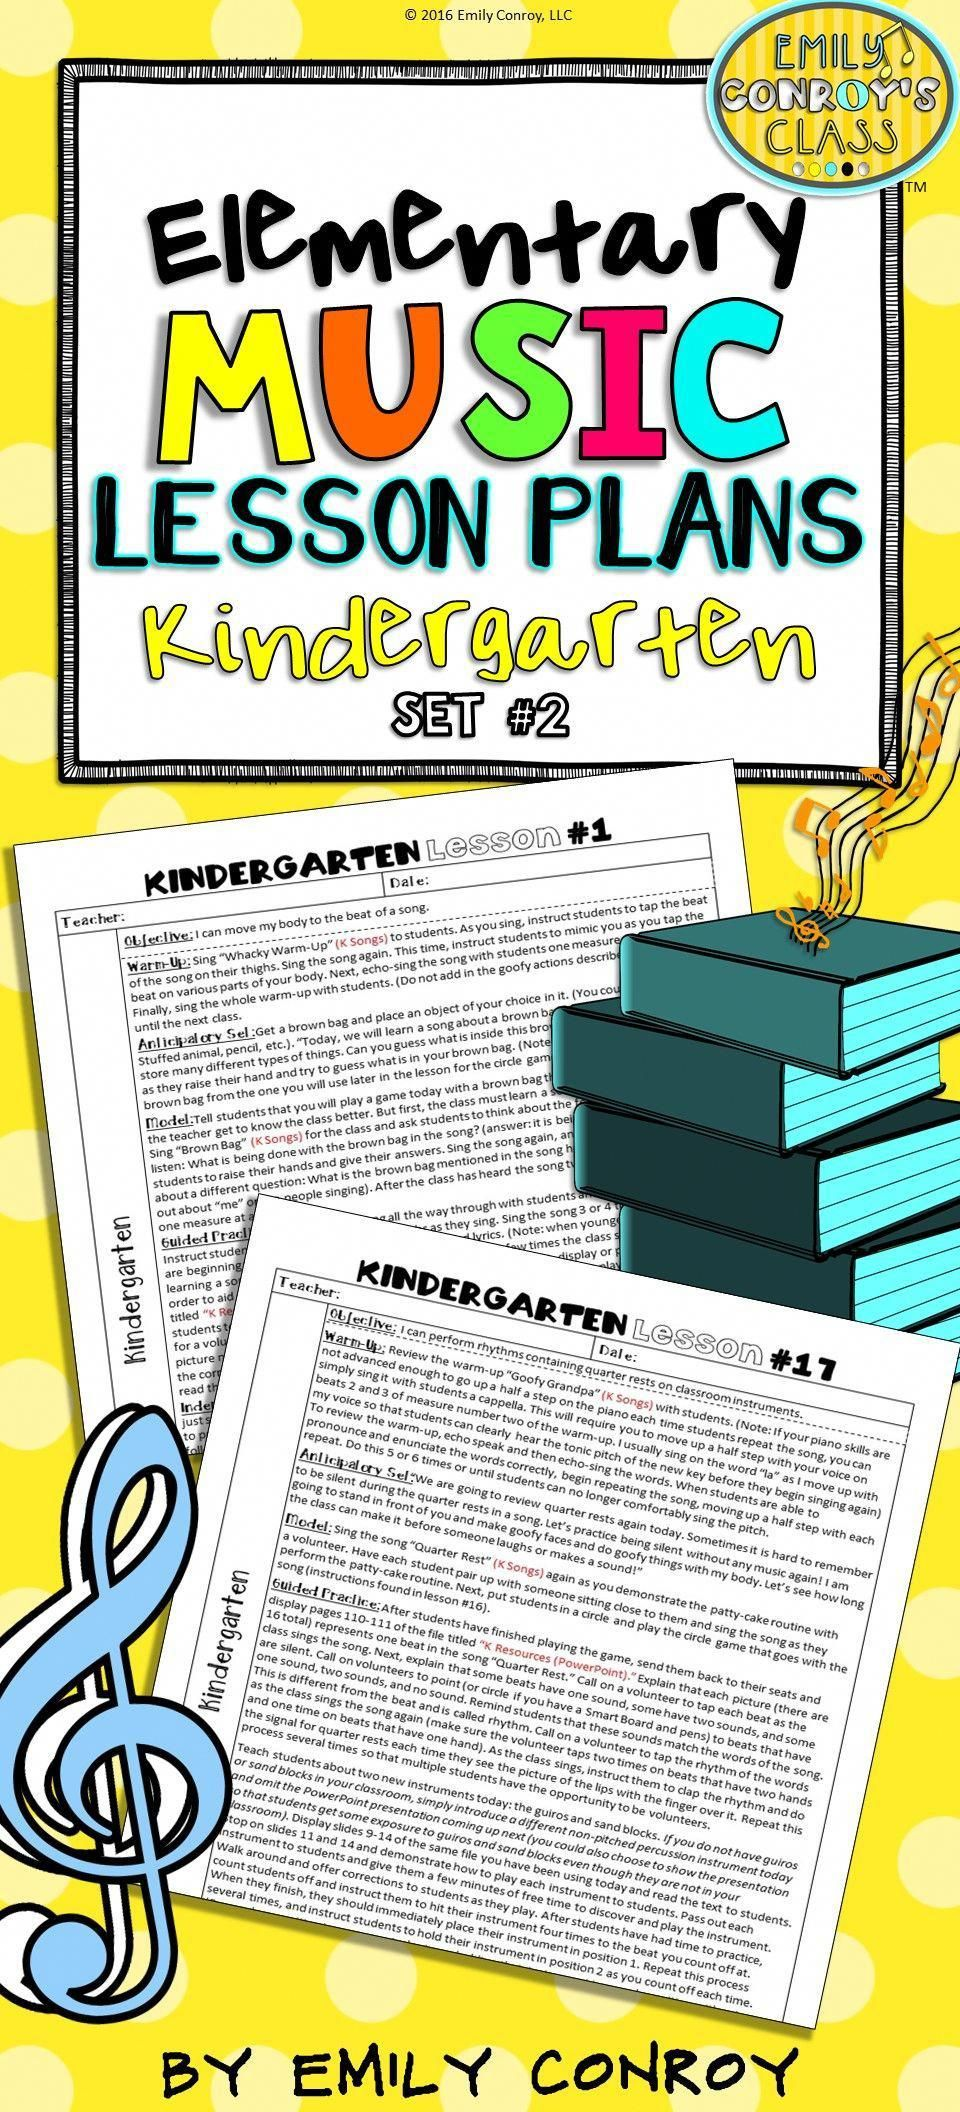 Kindergarten Music Lesson Plans (Set #2) | Music lessons ...